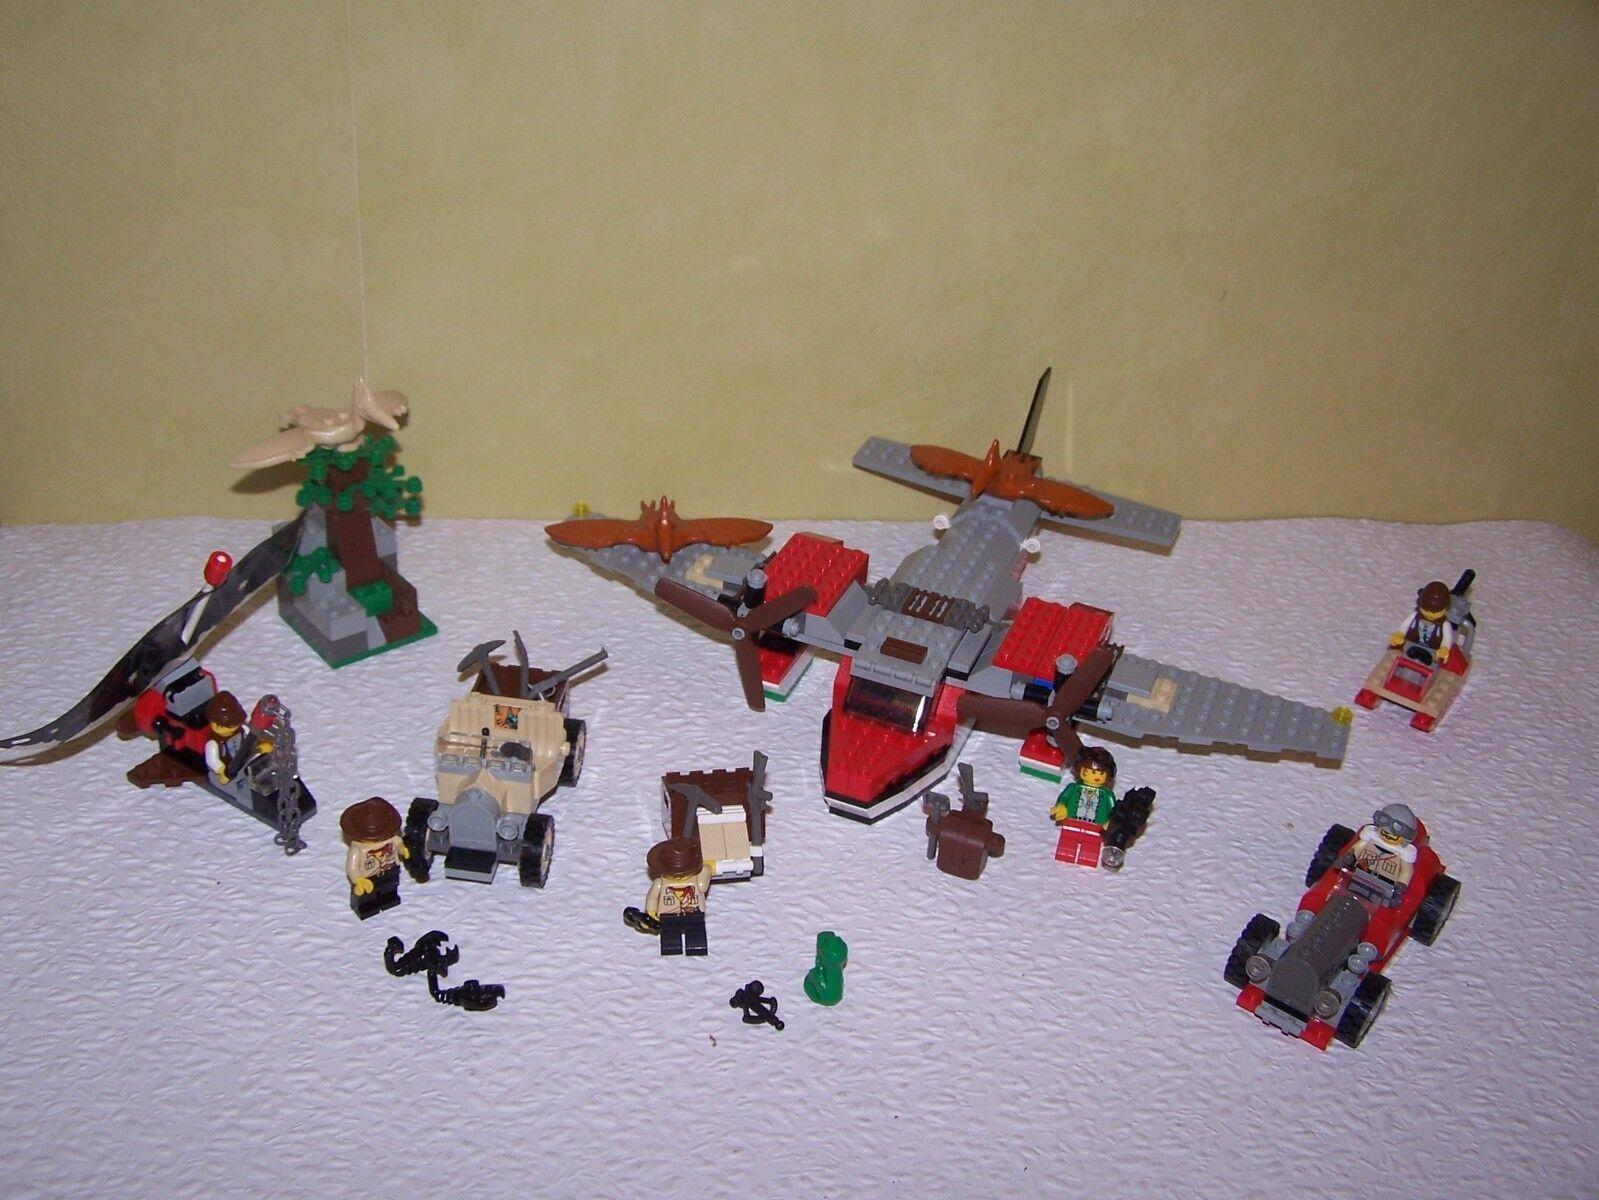 Lego 5935 5921 5918 5920 5912 5912 5912 5903 Adventurers Dino Dinos 9bf7cb